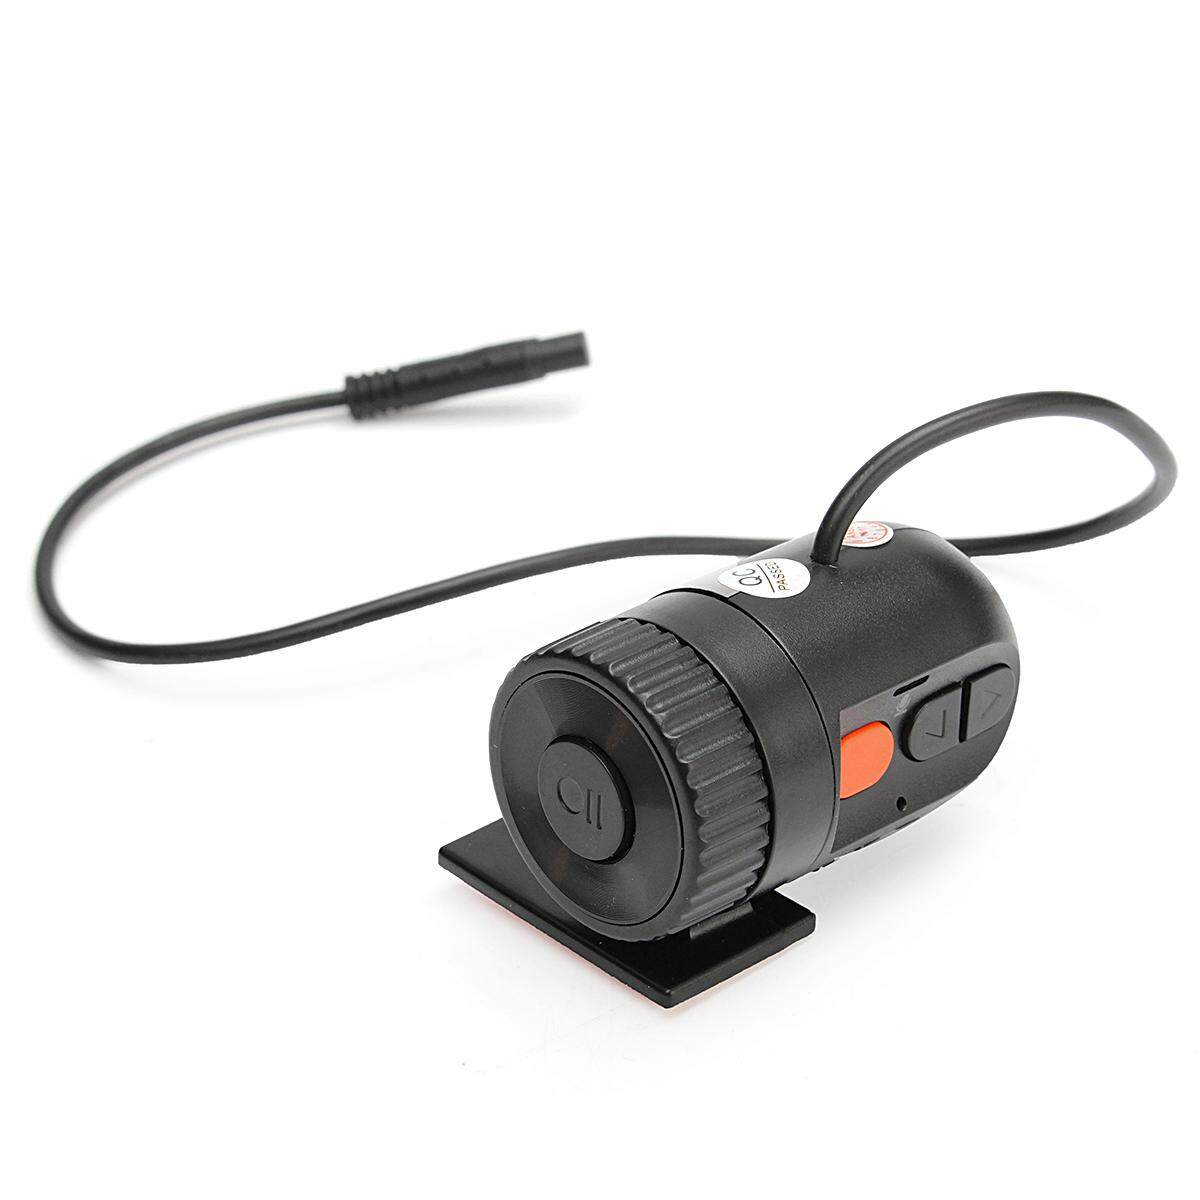 Hd Mini Car Dvr Video Recorder Hidden Dash Cam Vehicle Spy Camera Night Vision - Intl By Audew.